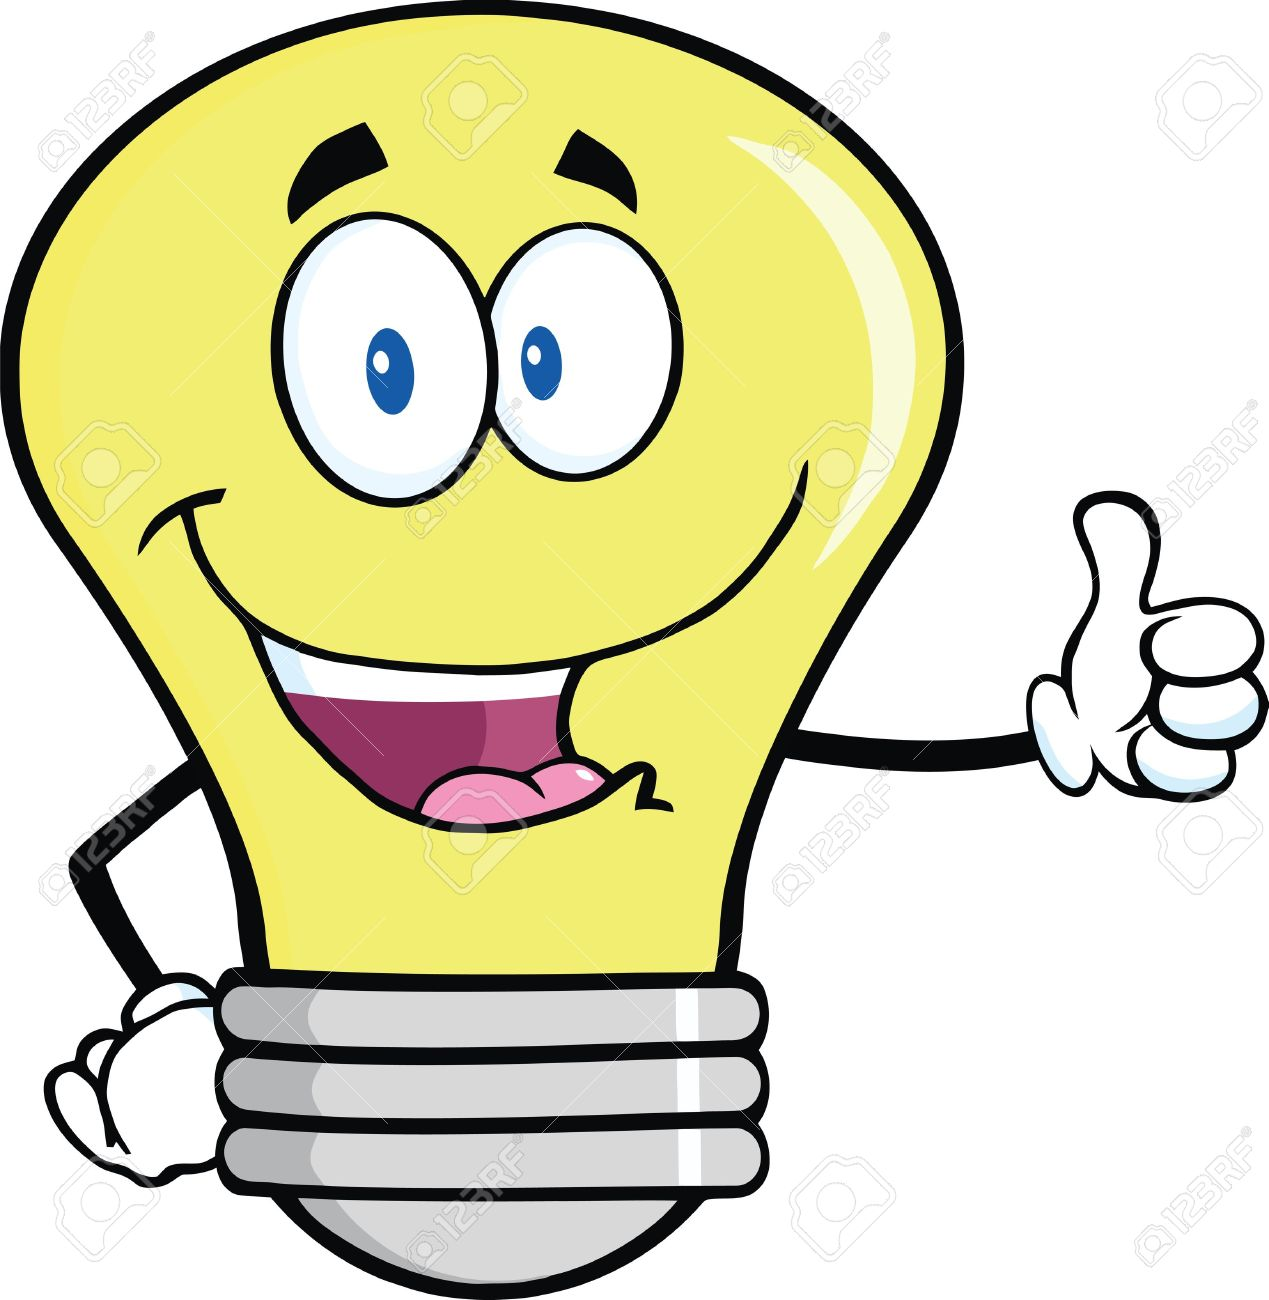 Idea Light Bulb: Light Bulb Cartoon Mascot Character Giving A Thumb Up